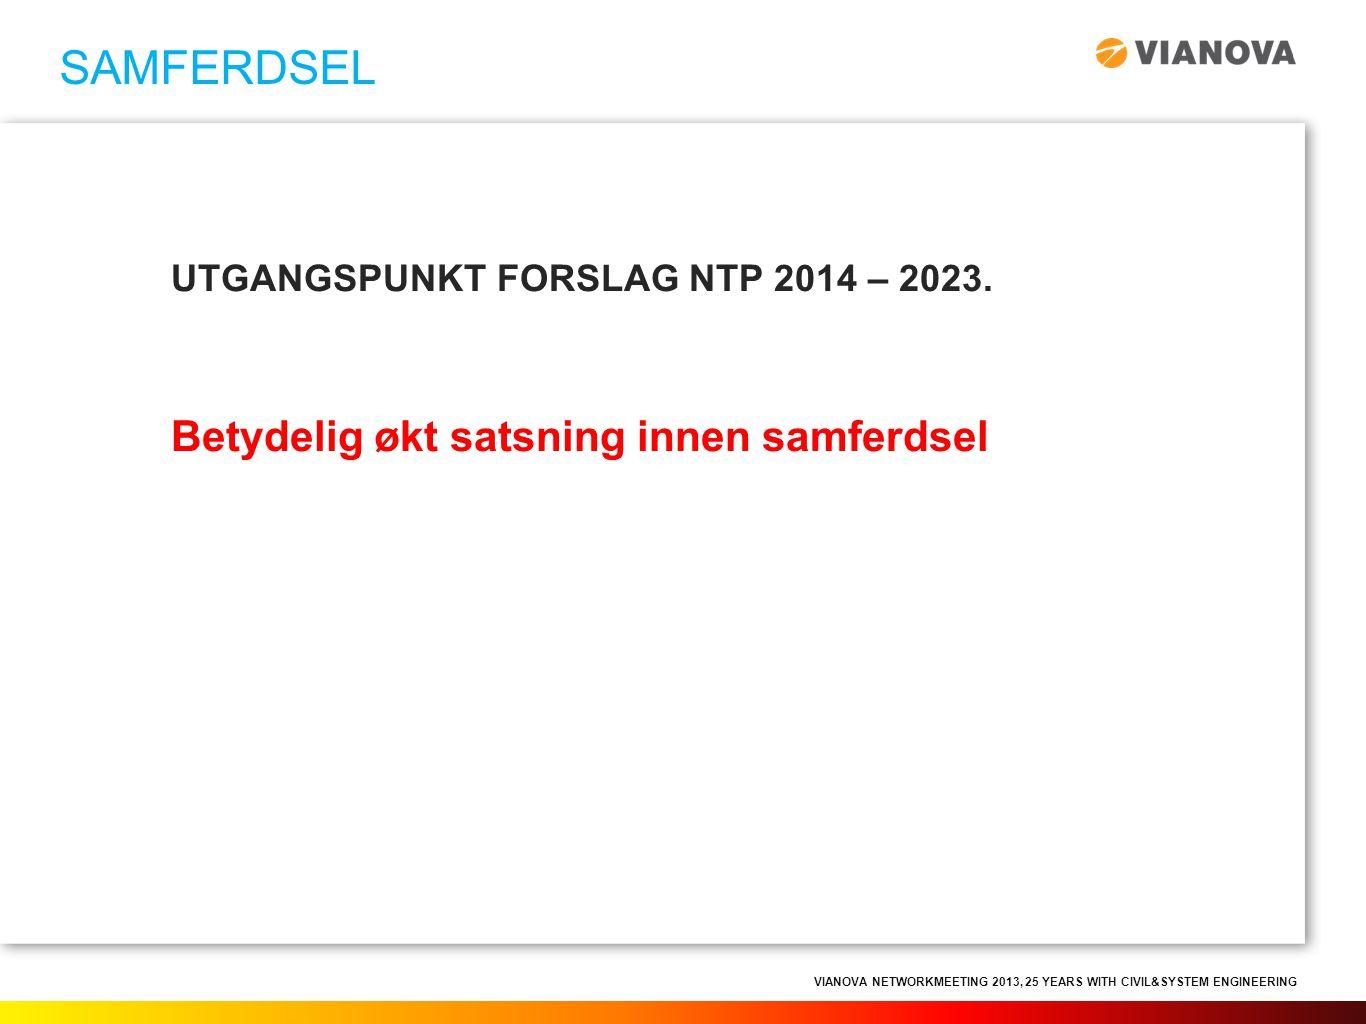 VIANOVA NETWORKMEETING 2013, 25 YEARS WITH CIVIL&SYSTEM ENGINEERING UTGANGSPUNKT FORSLAG NTP 2014 – 2023. Betydelig økt satsning innen samferdsel SAMF